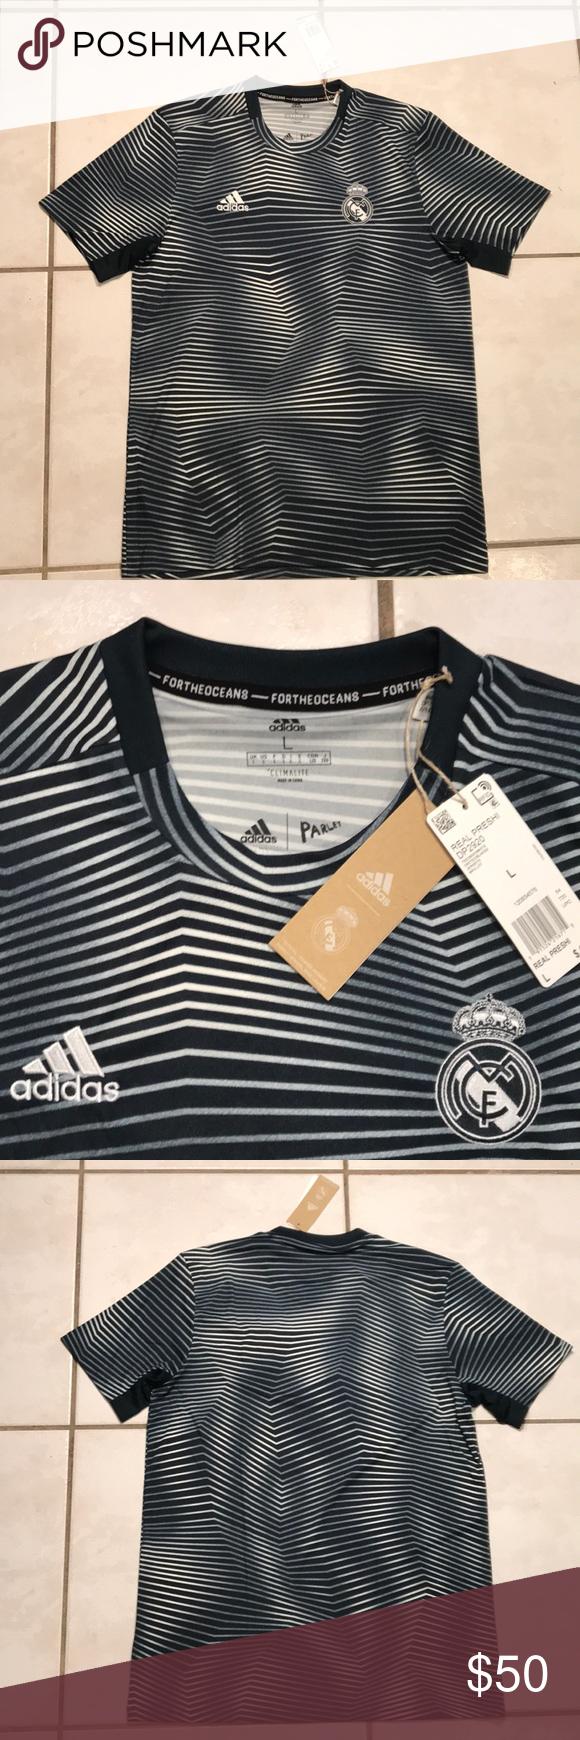 Nwt Adidas Real Madrid Pre Match Jersey Dp2920 Real Madrid Adidas Fashion